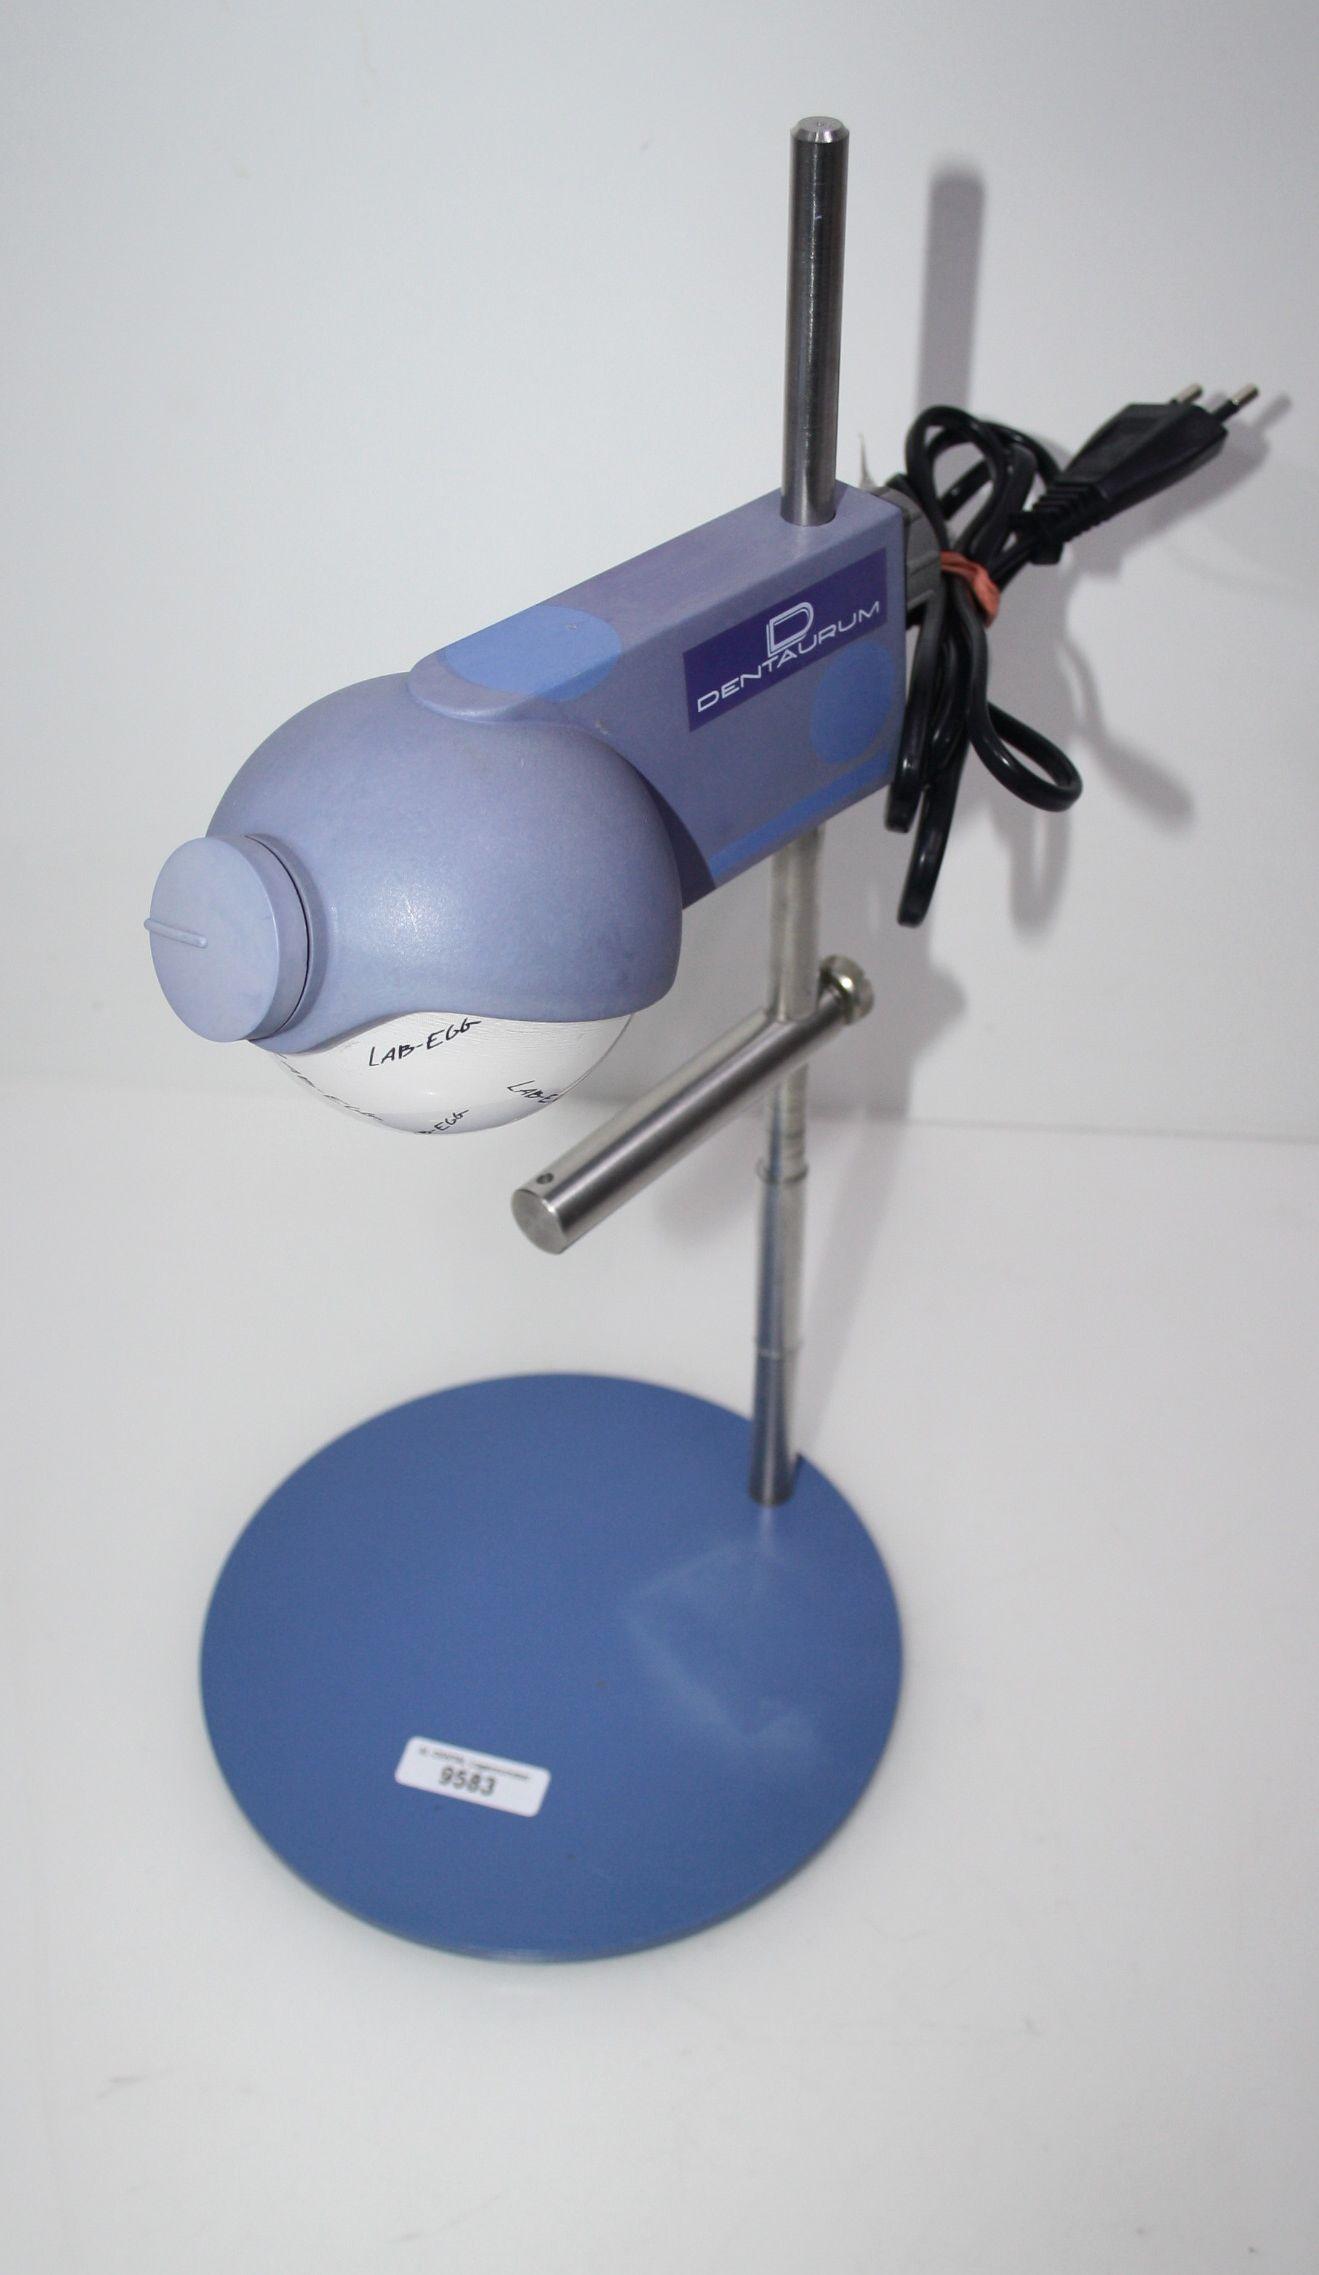 DENTAURUM Elektronisches Rührwerk RW 11 basic Lab Egg # 9583